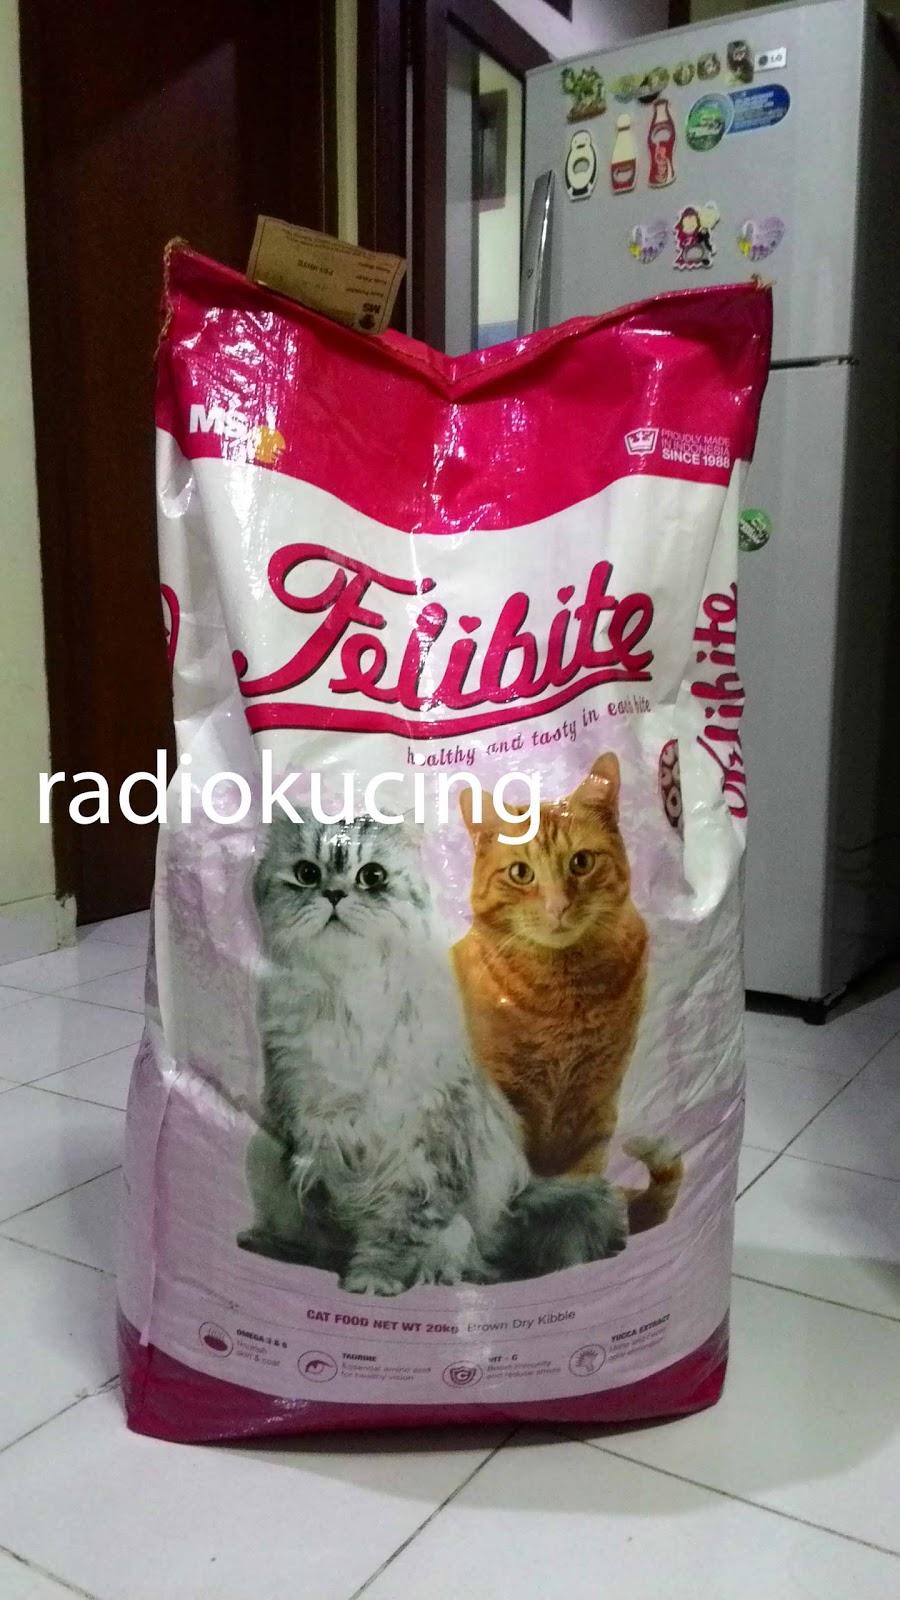 Tempat Jual Makanan Kucing Maxi Cat 20kg Food Terbaru 2018 Po Oppo F9 Smartphone 4gb 64gb Bonushf Bluetooth Pubg Crate Sunrise Red Review Felibite Buatan Indonesia Dijual Dalam Kemasan 1 Karung Seberat